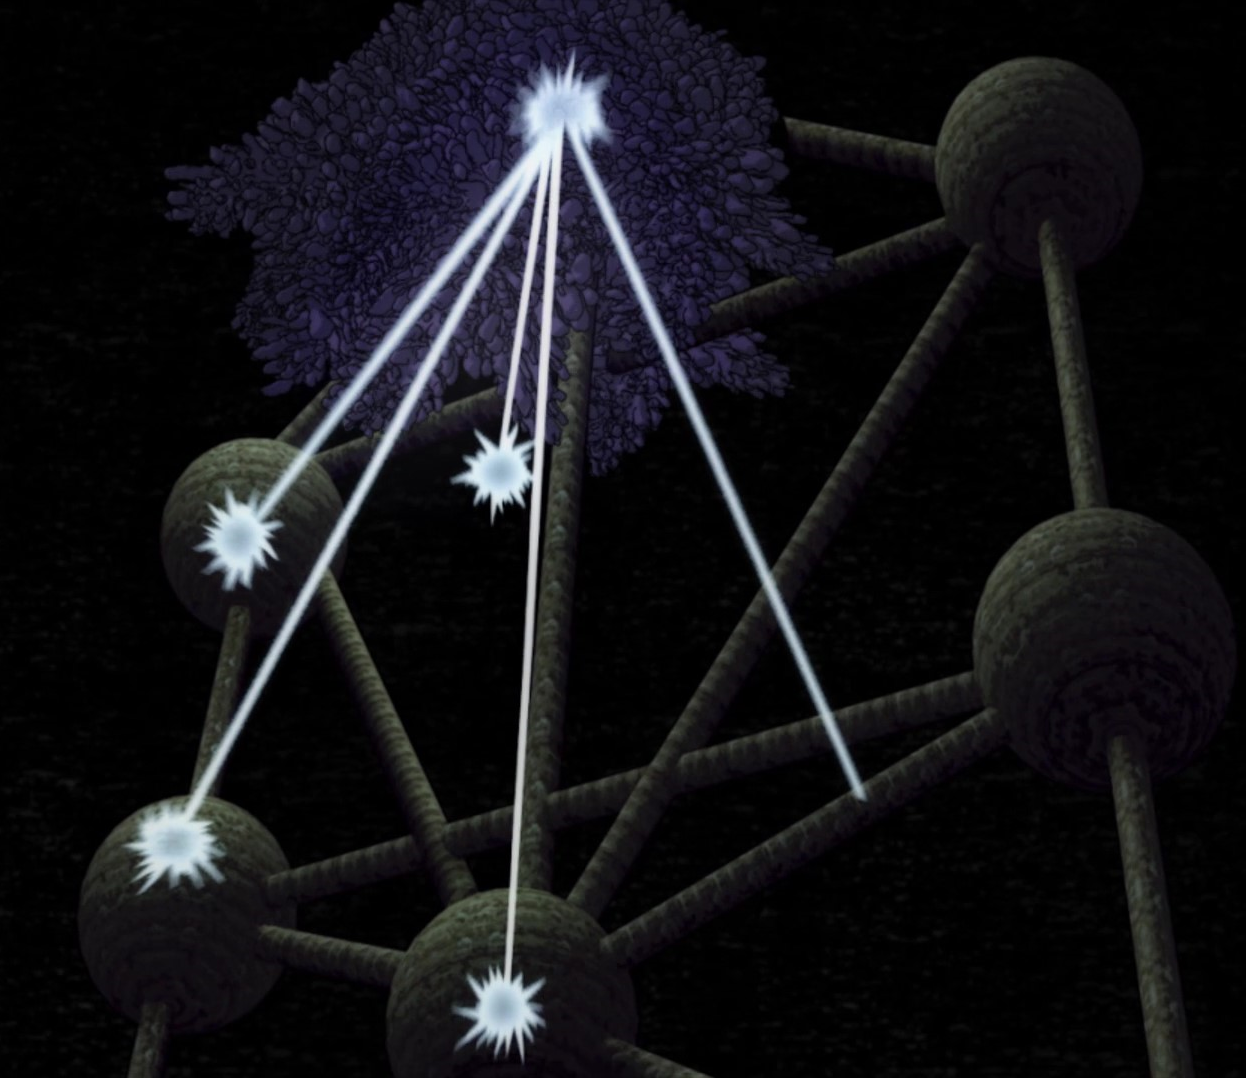 Demon-Dweller Sword: Protecting Light